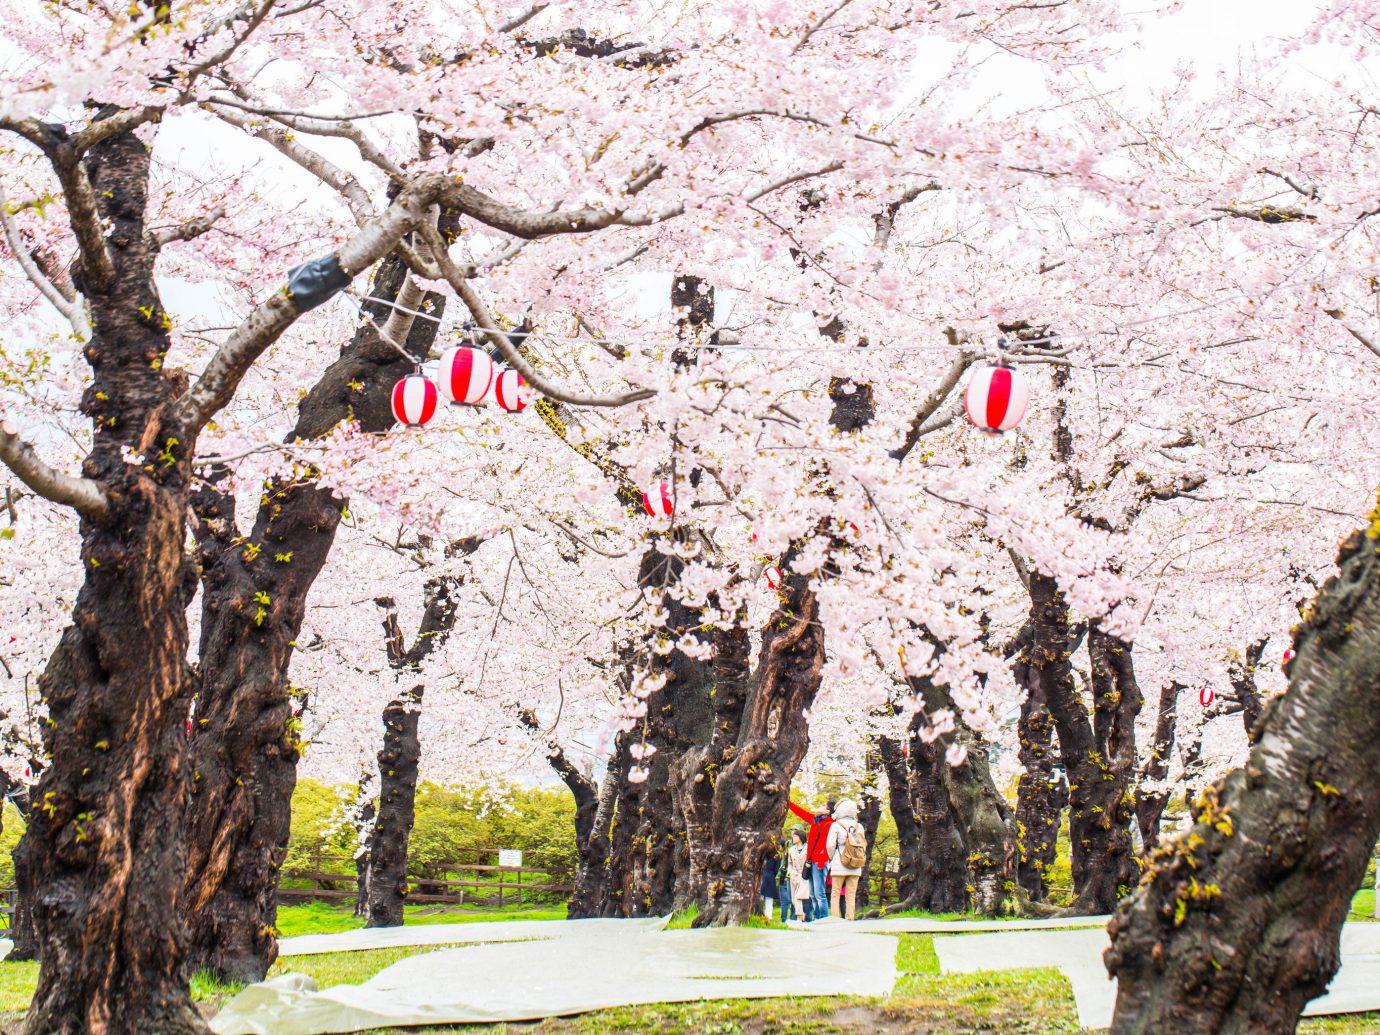 Japan Trip Ideas flower plant tree blossom cherry blossom spring branch